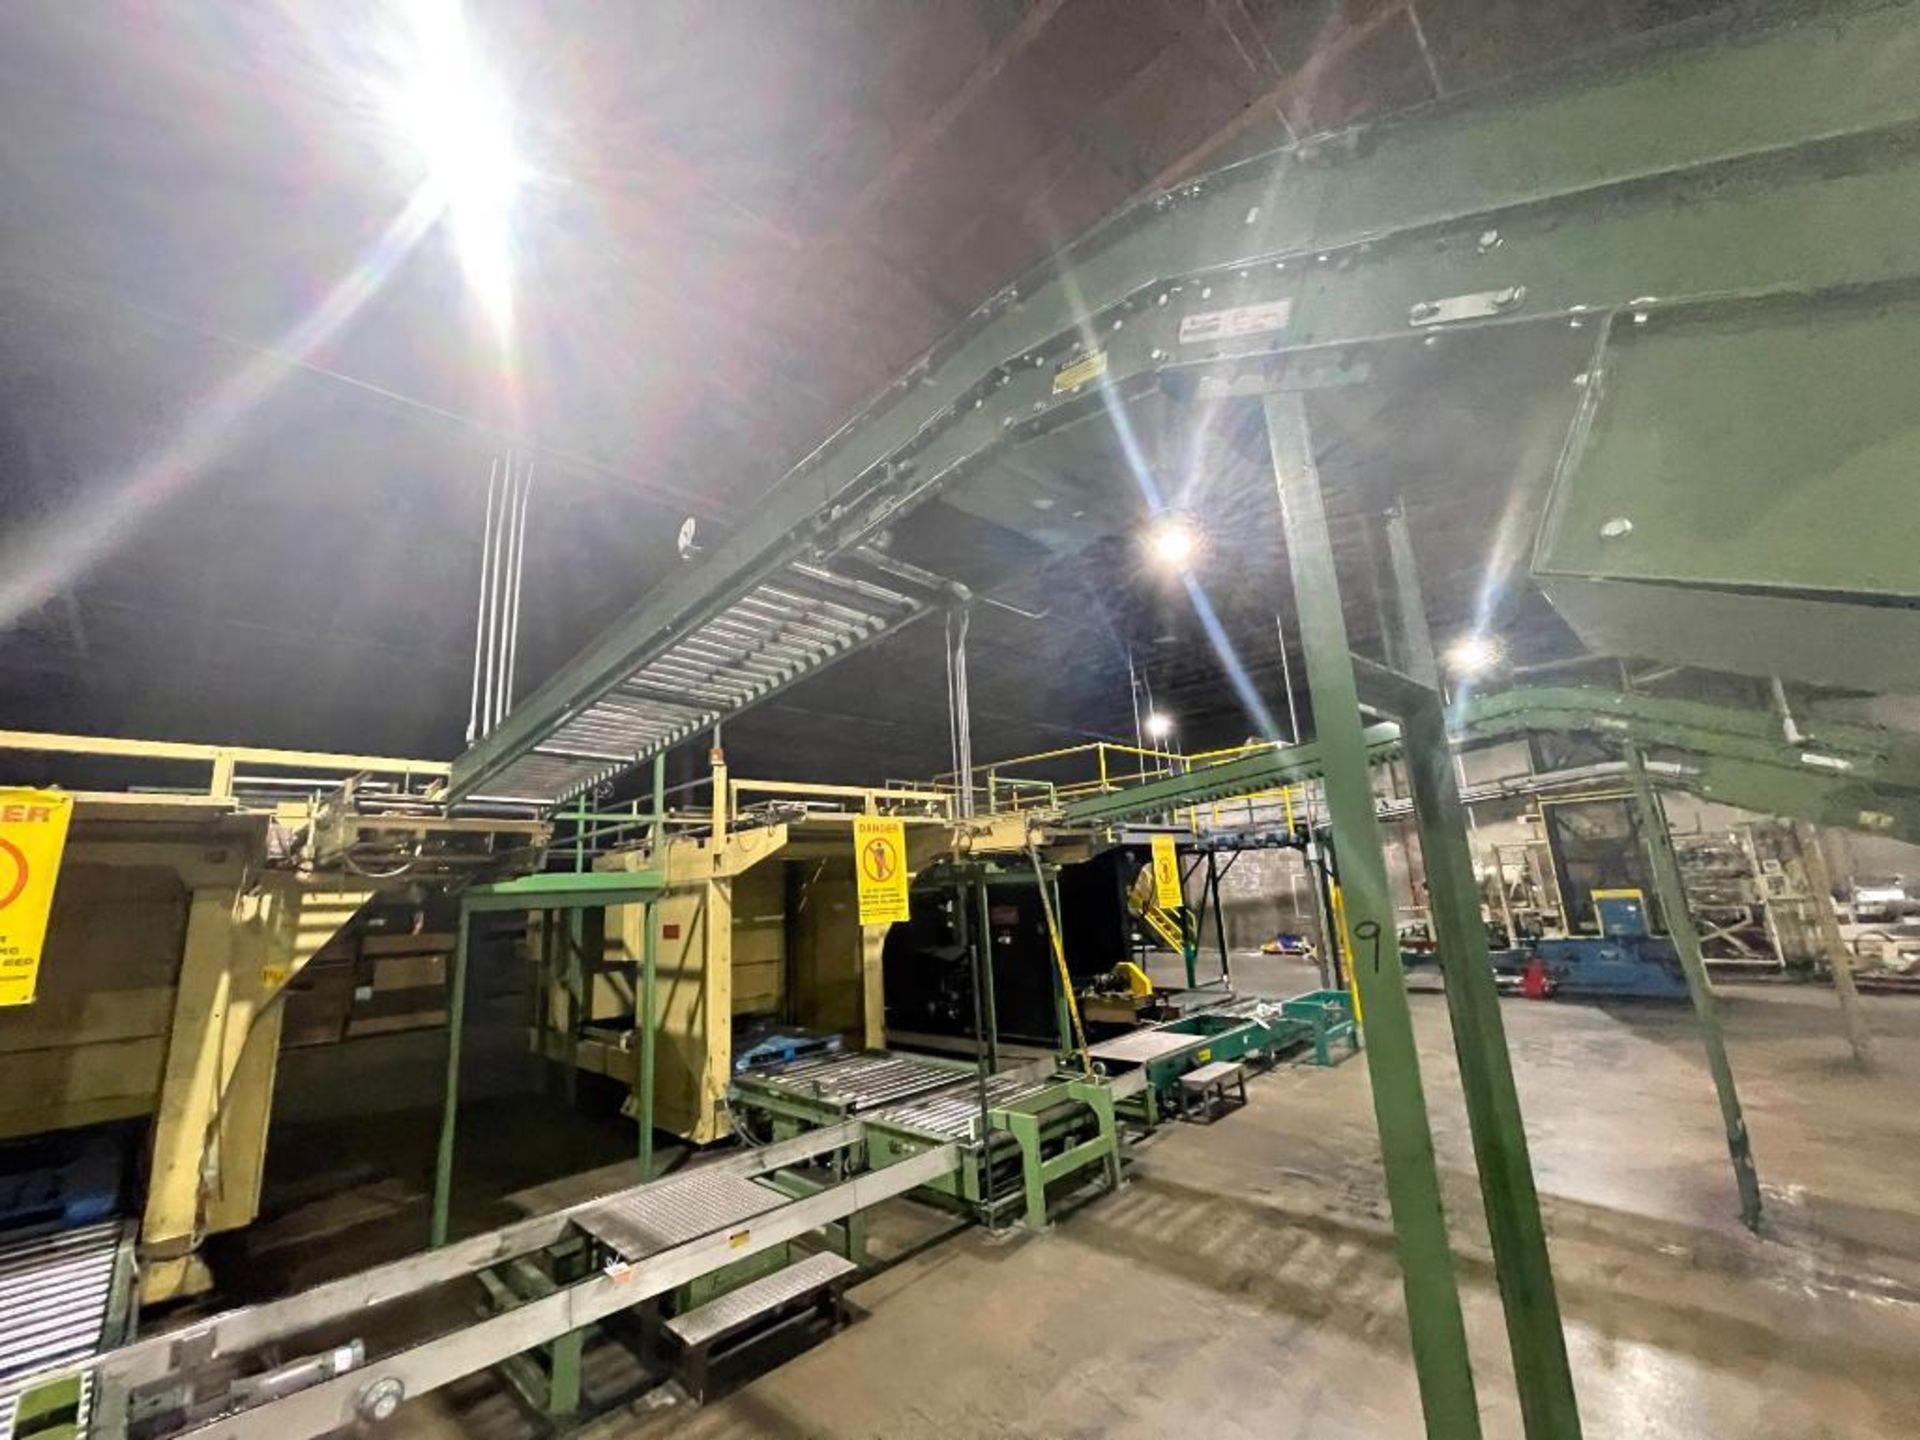 mild steel incline conveyor - Image 5 of 5